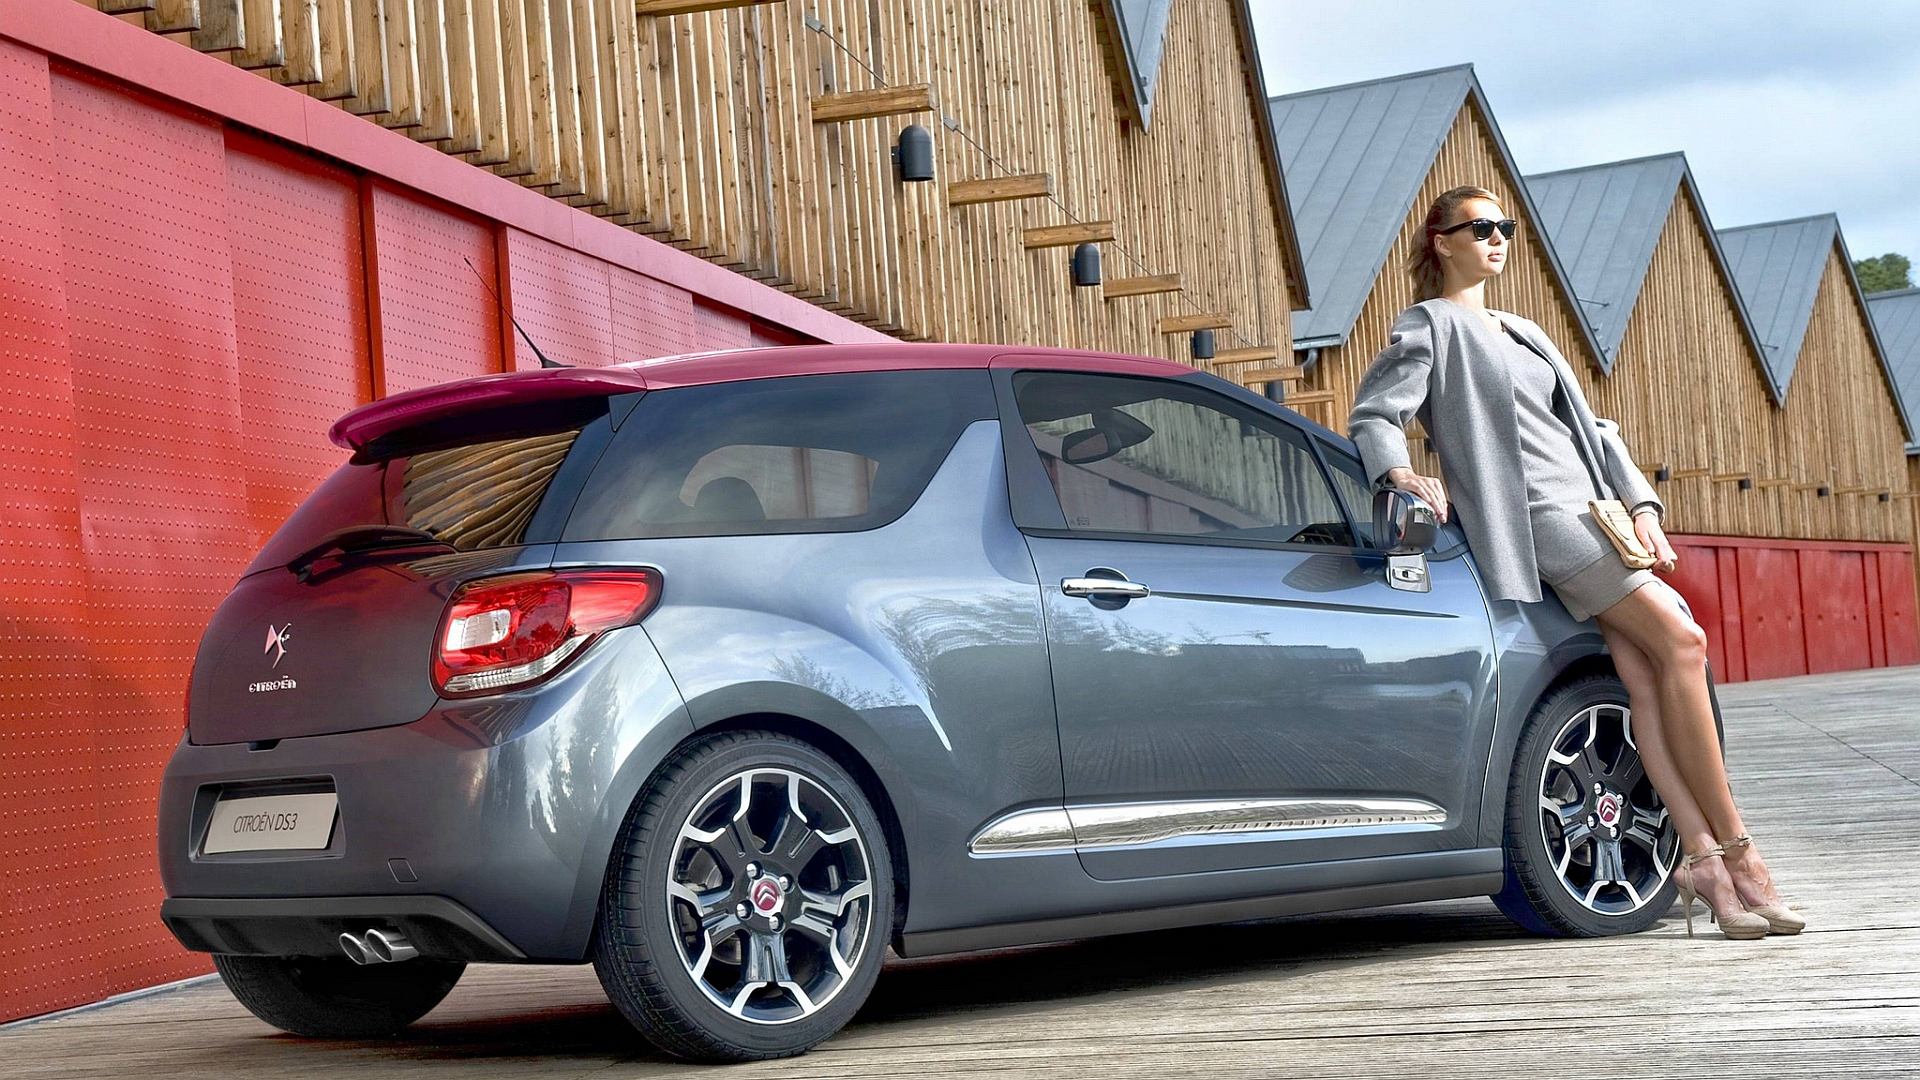 Girls & Cars HD Wallpaper | Background Image | 1920x1080 ...